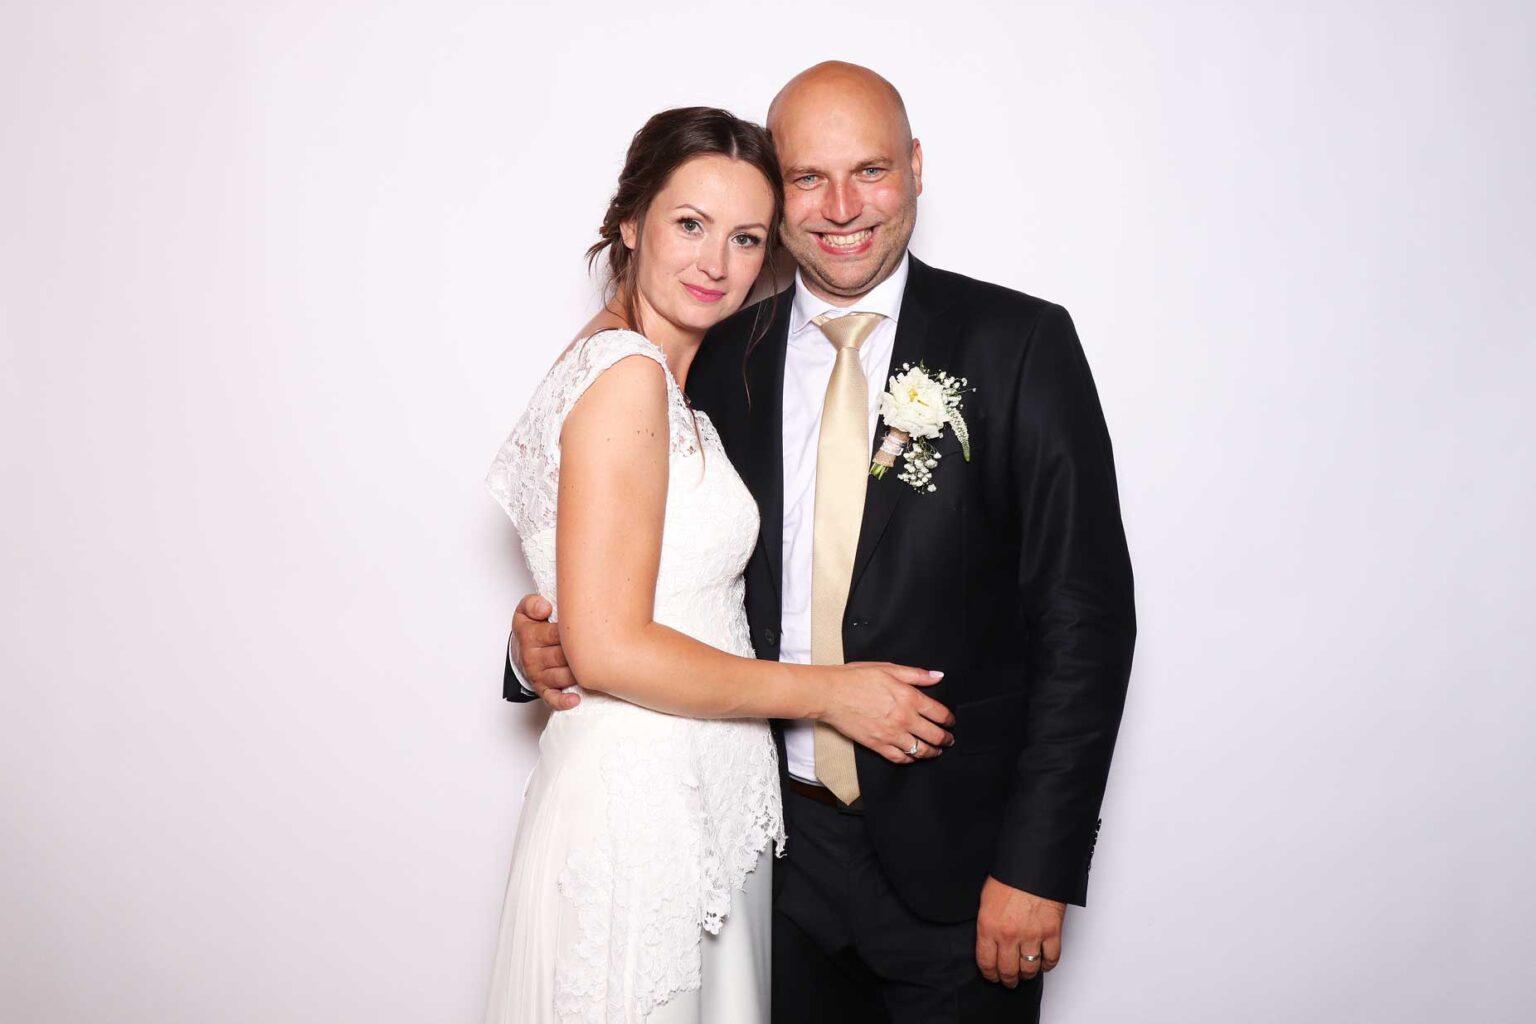 Fotostena White - Biela - fotopozadie na svadbu - fotokútik.